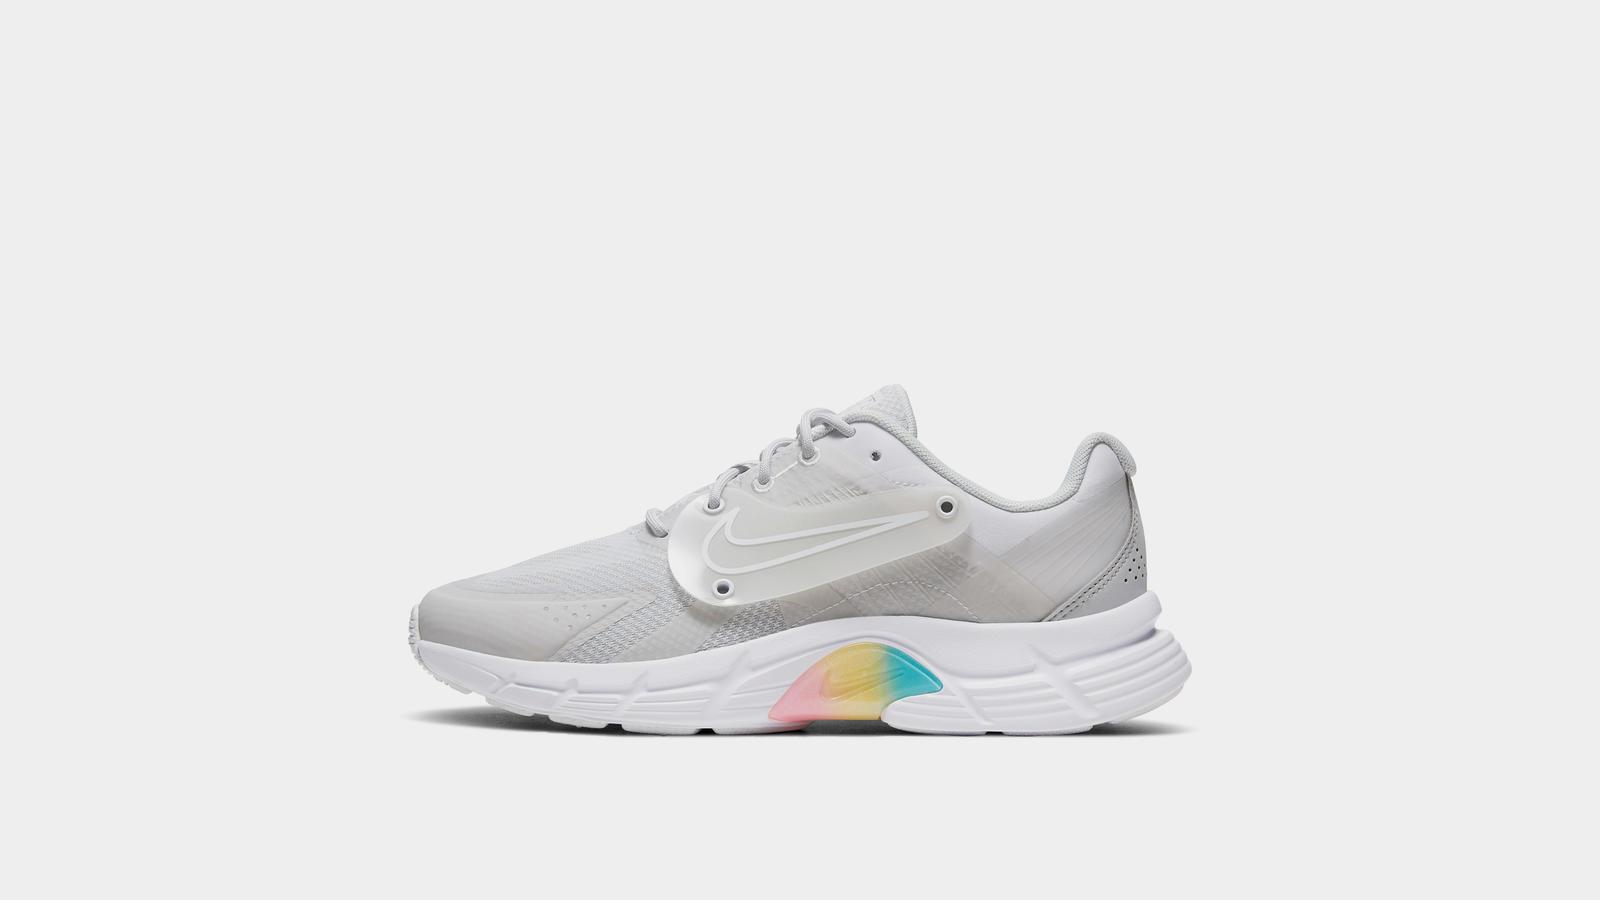 Nike Alphina 5000 7